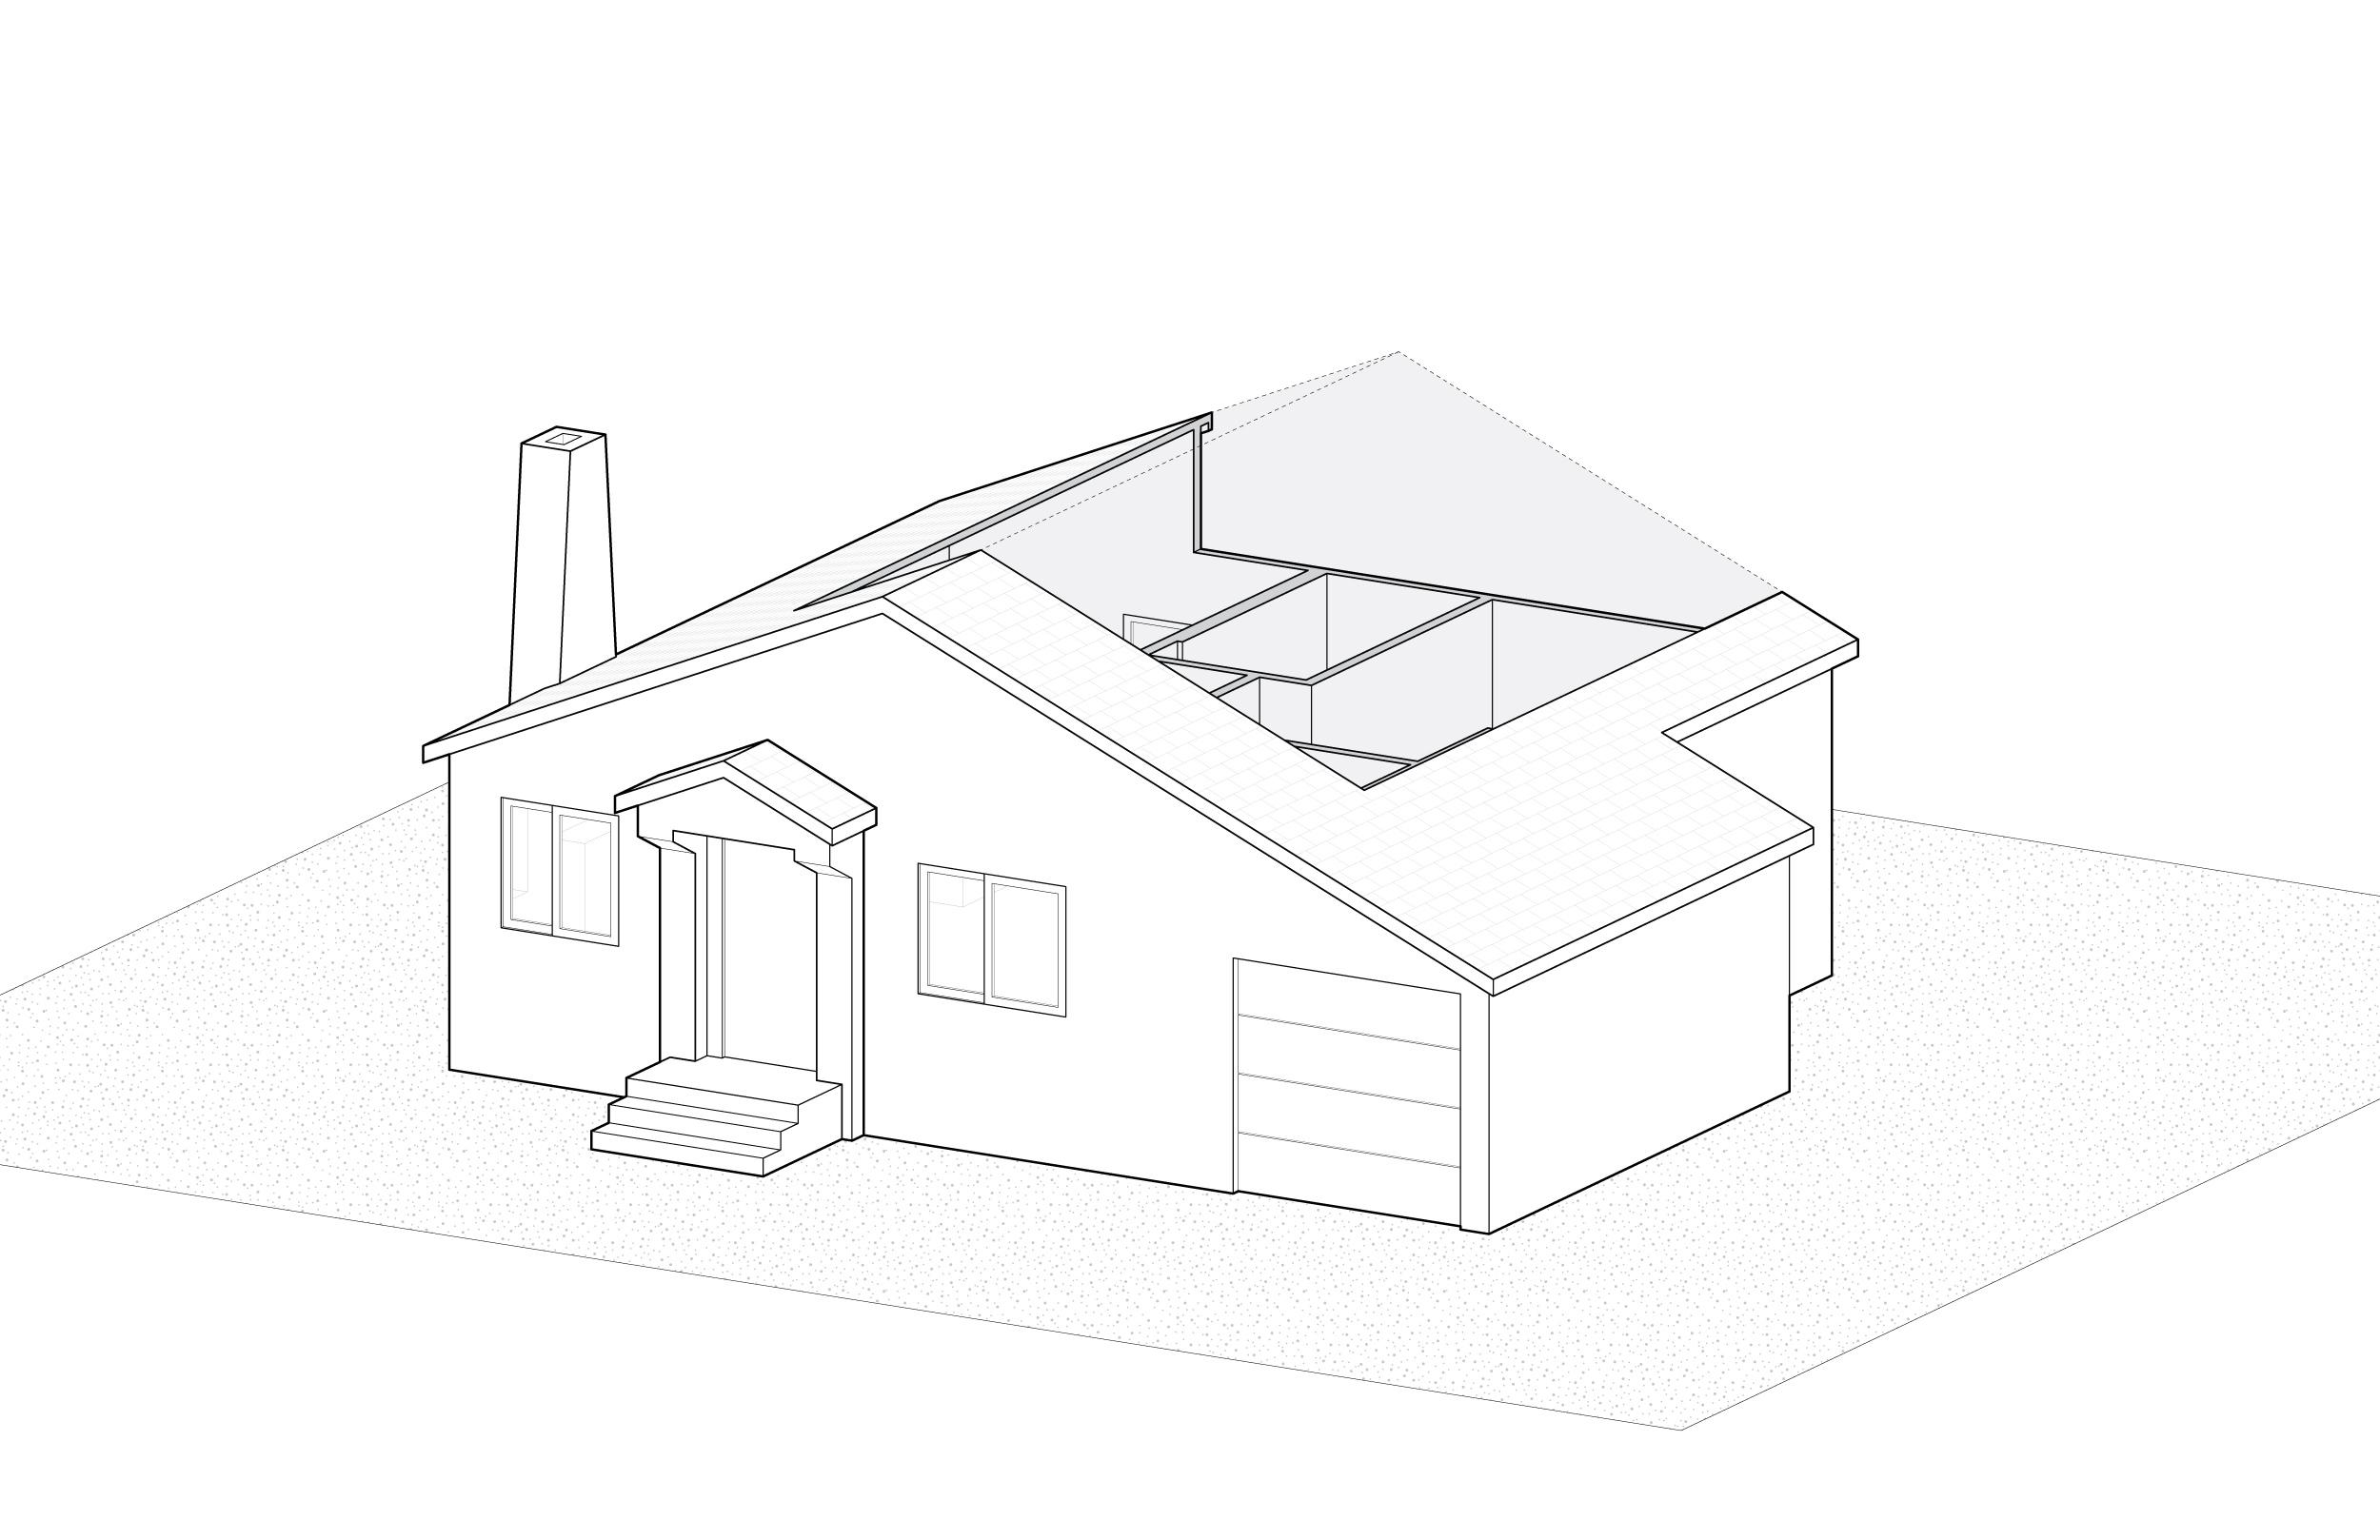 Rosewood-House_Diagram_02.jpg